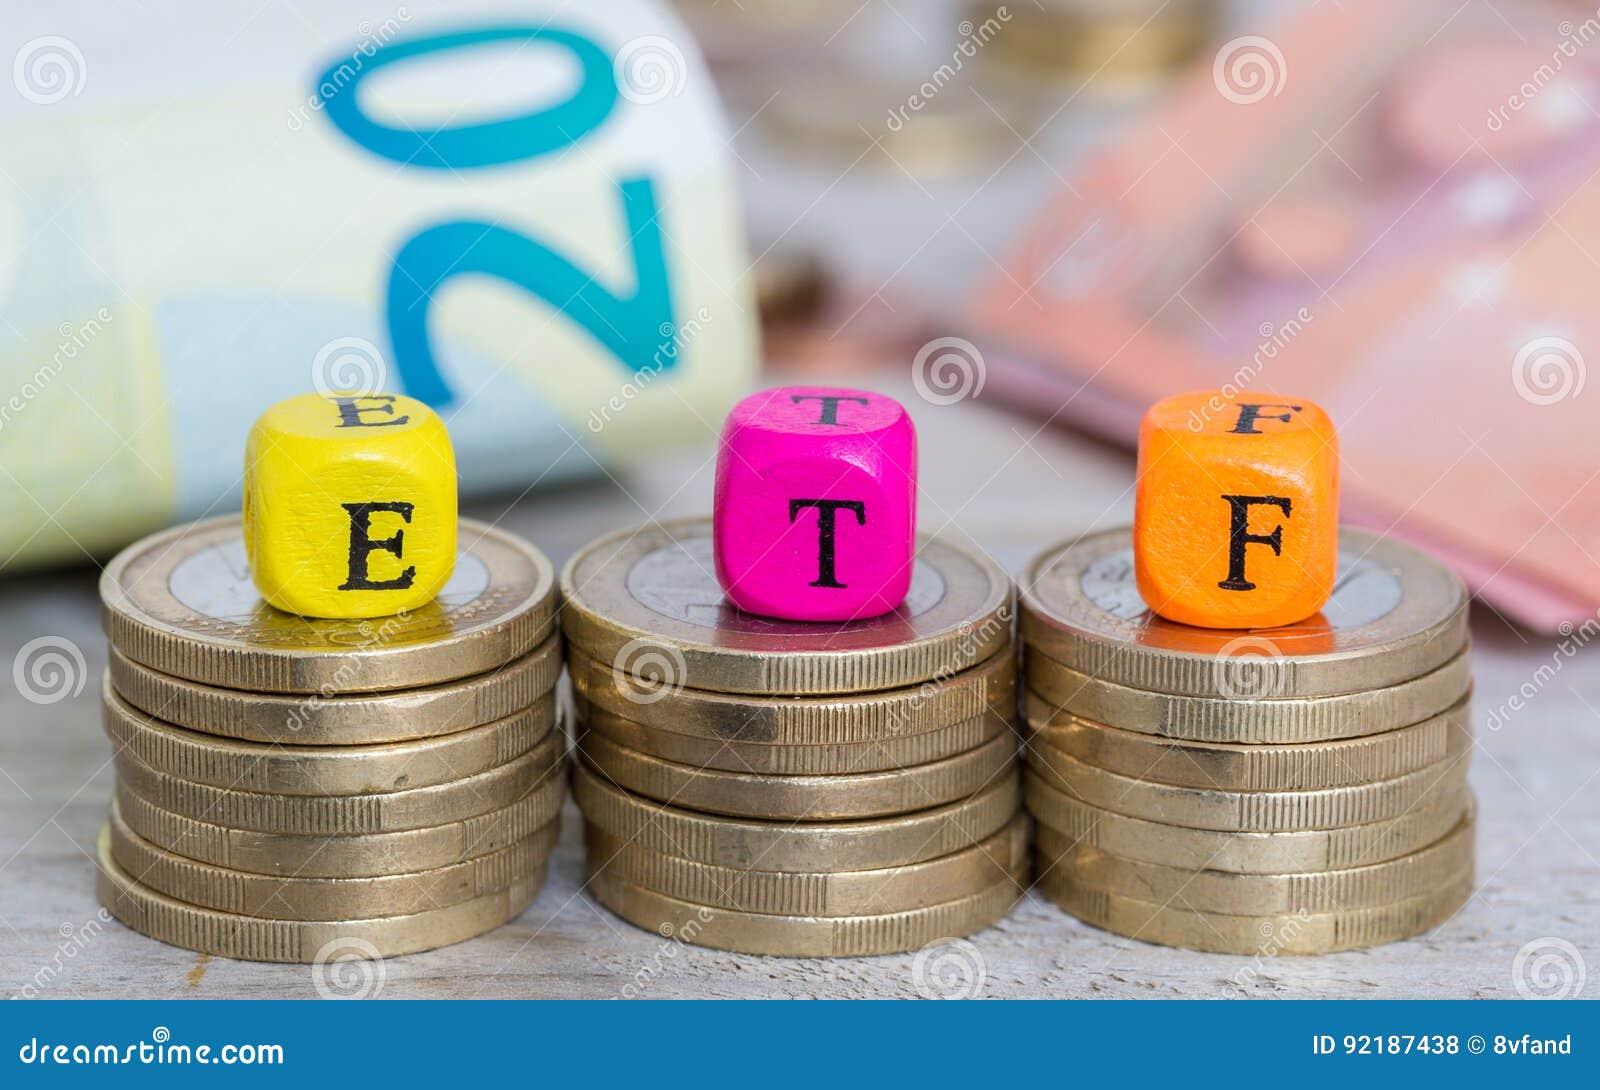 ETF letter cubes on coins concept